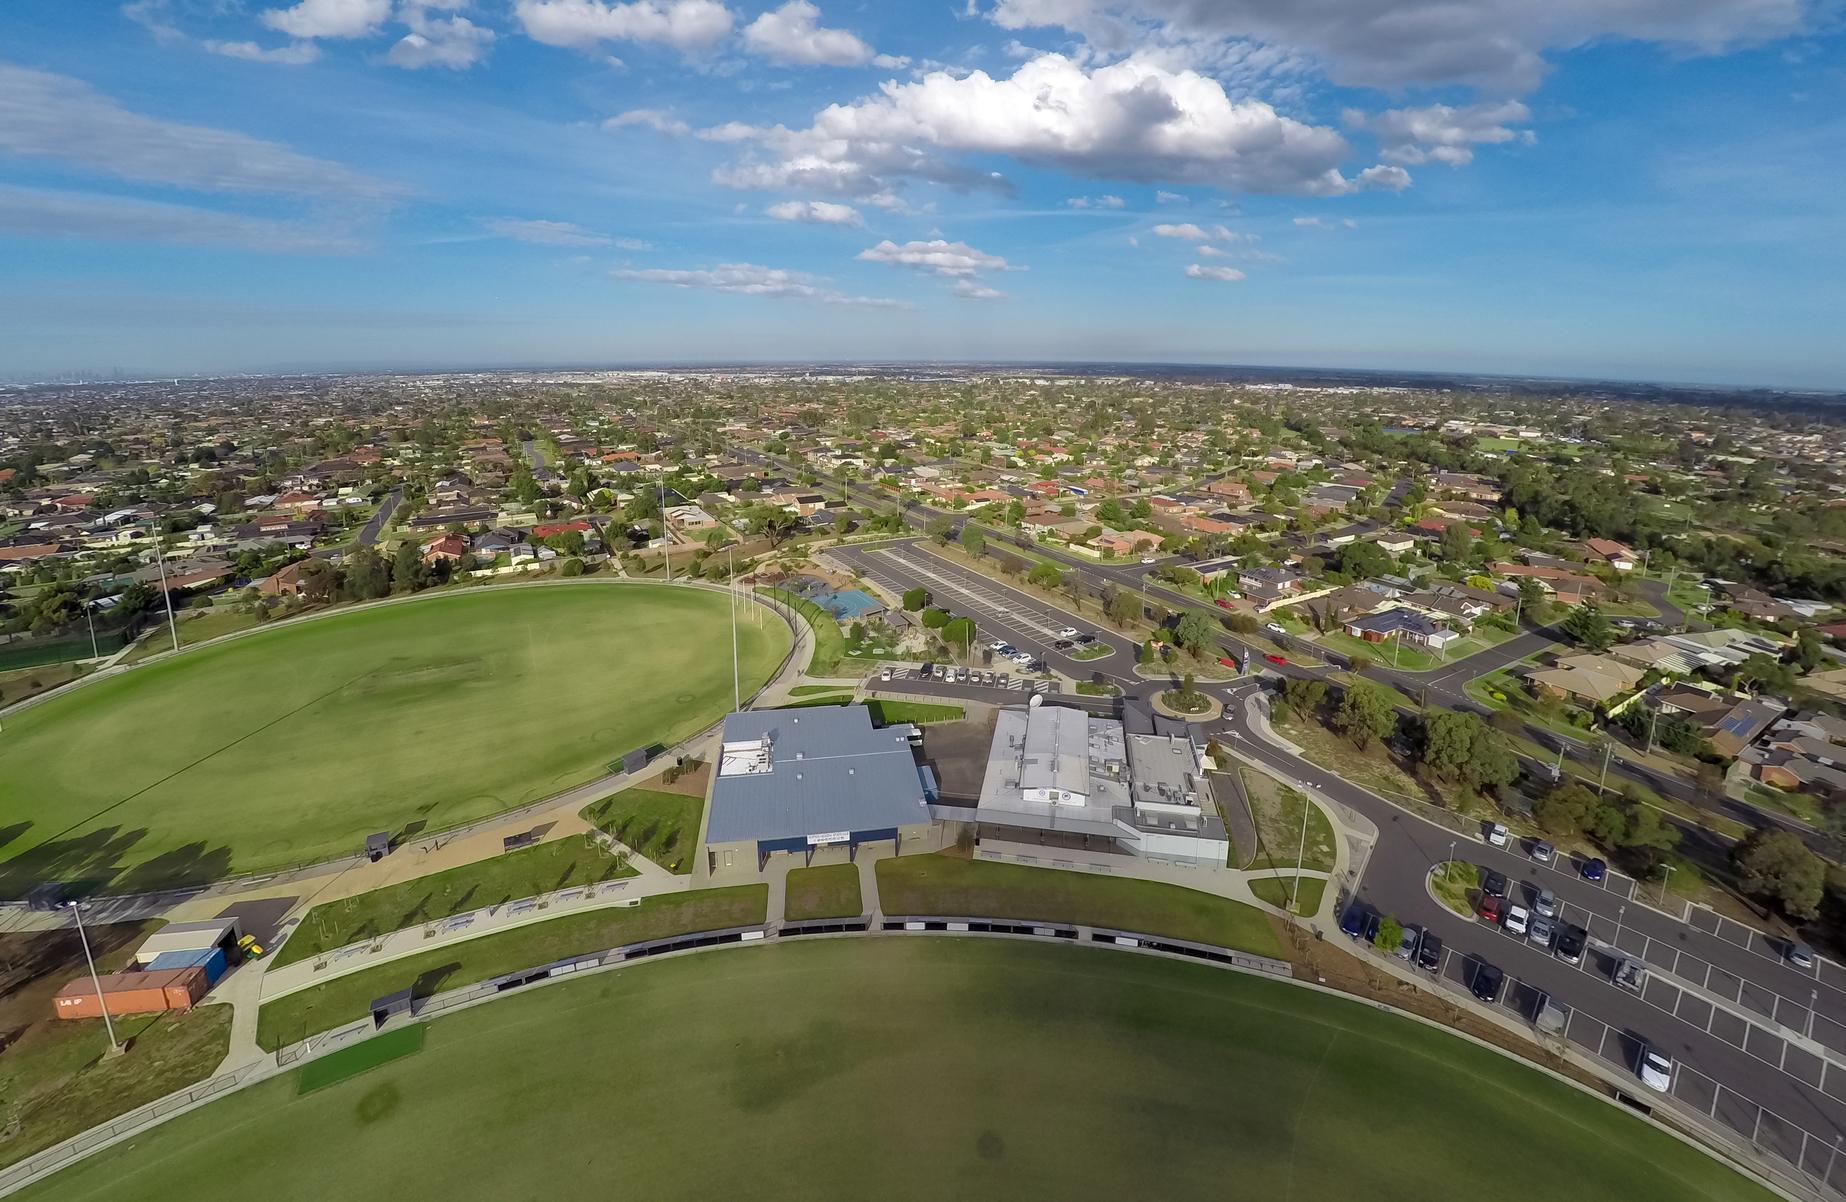 2Construct - Hogans Road Oval 01